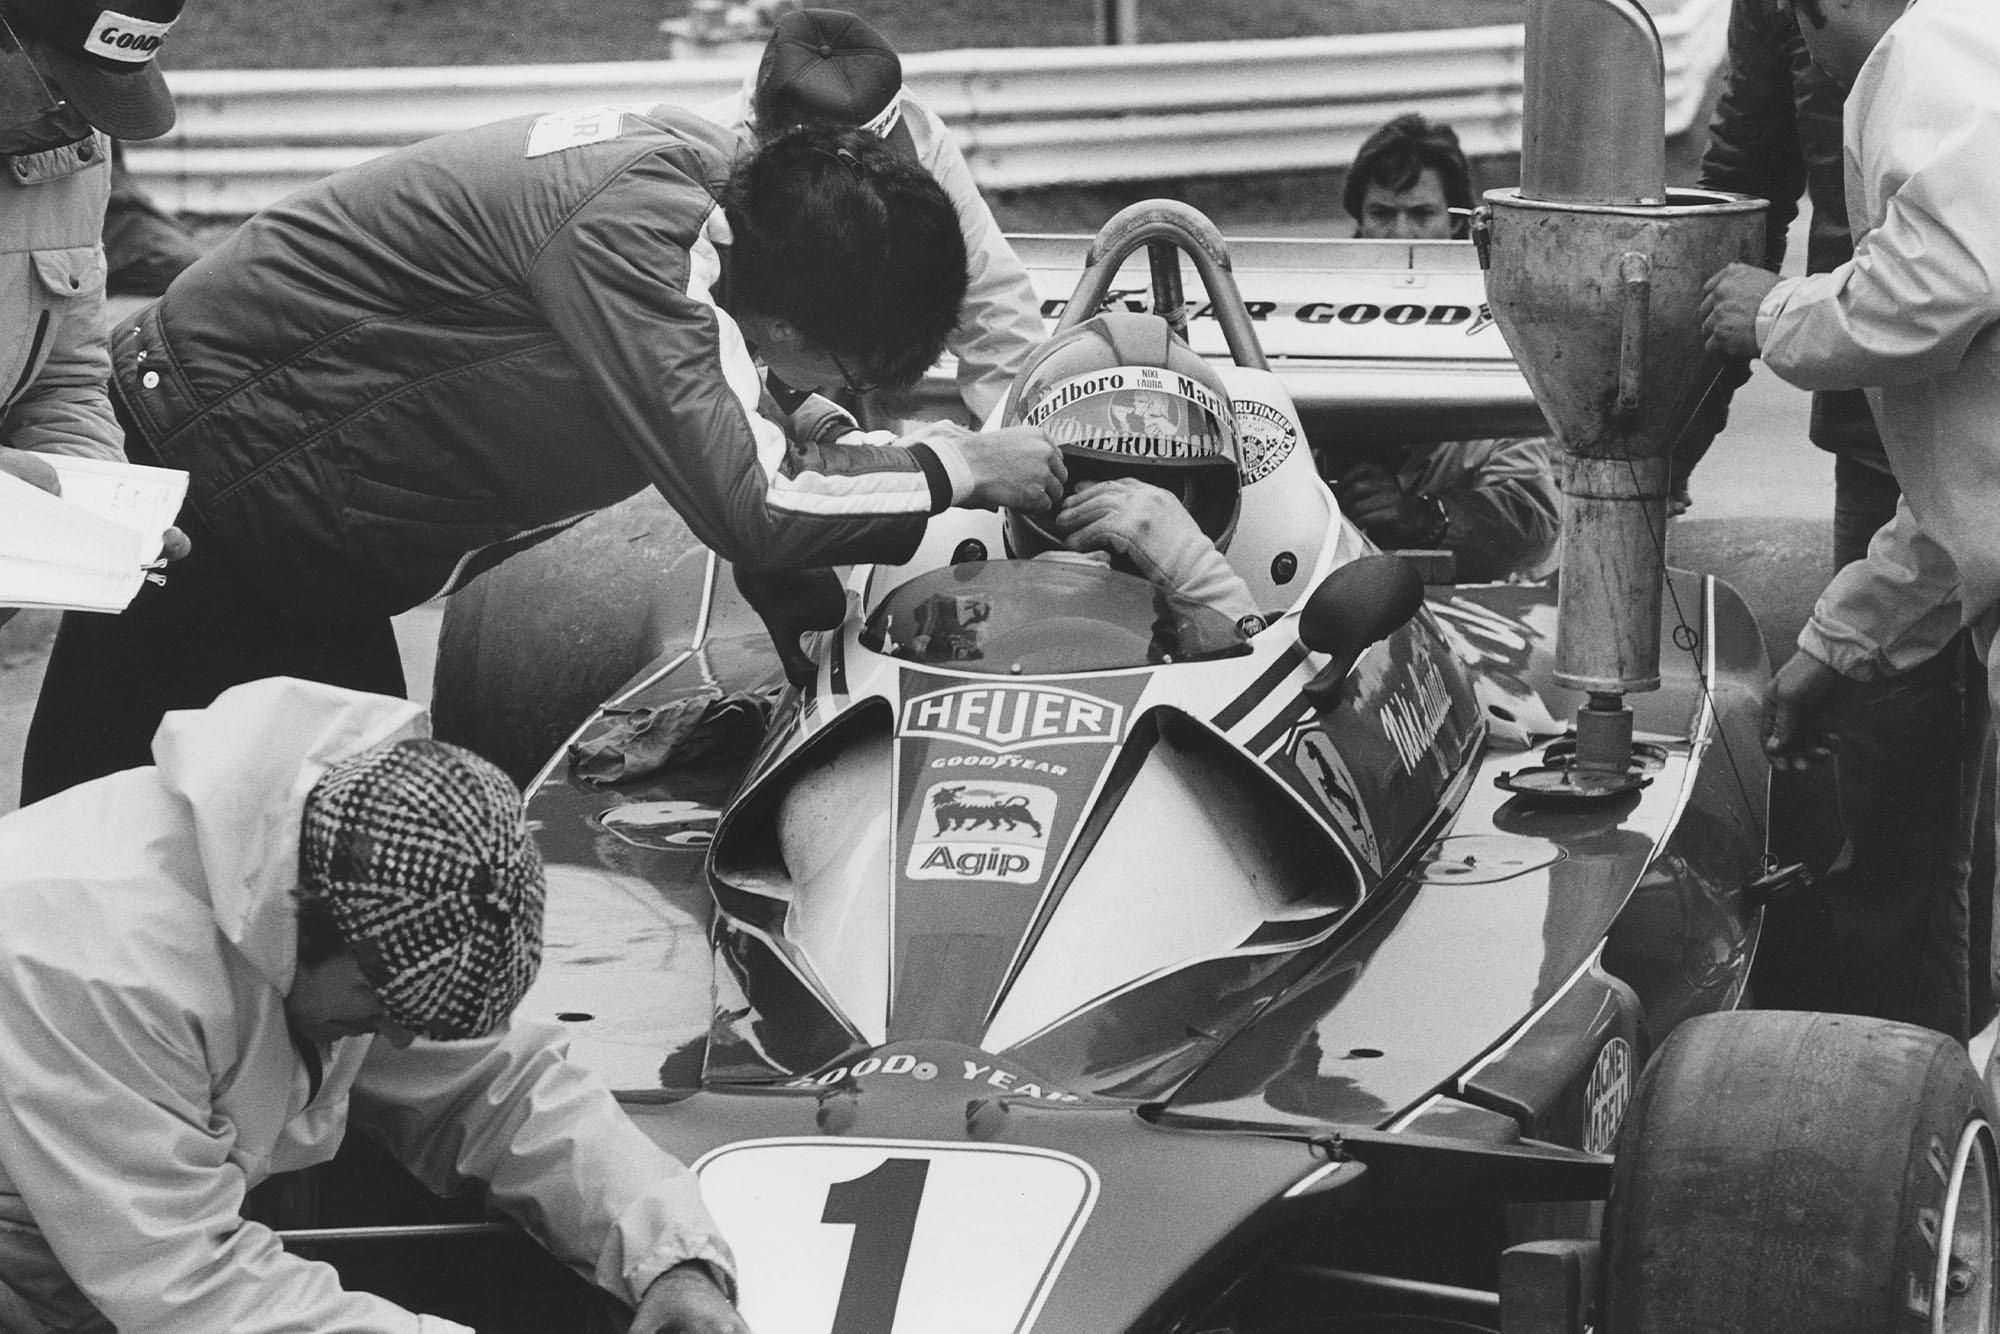 Niki Lauda (Ferrari) sits in his car at the 1976 United States Grand Prix East, Watkins Glen.